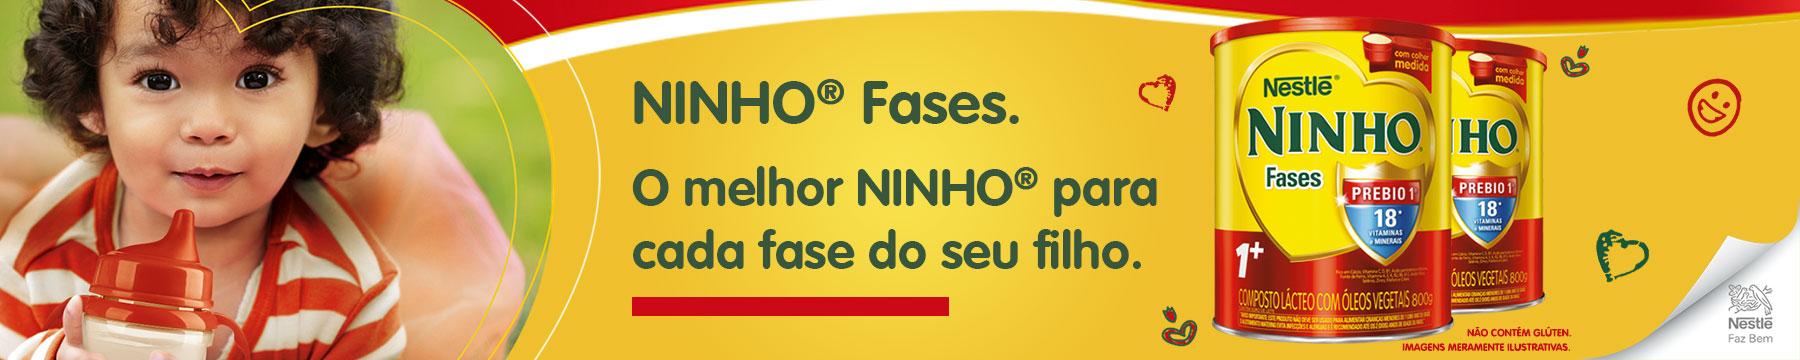 E29a721f13651140209df5c34abe53a20db3ff371800x360 header ninho fases 1